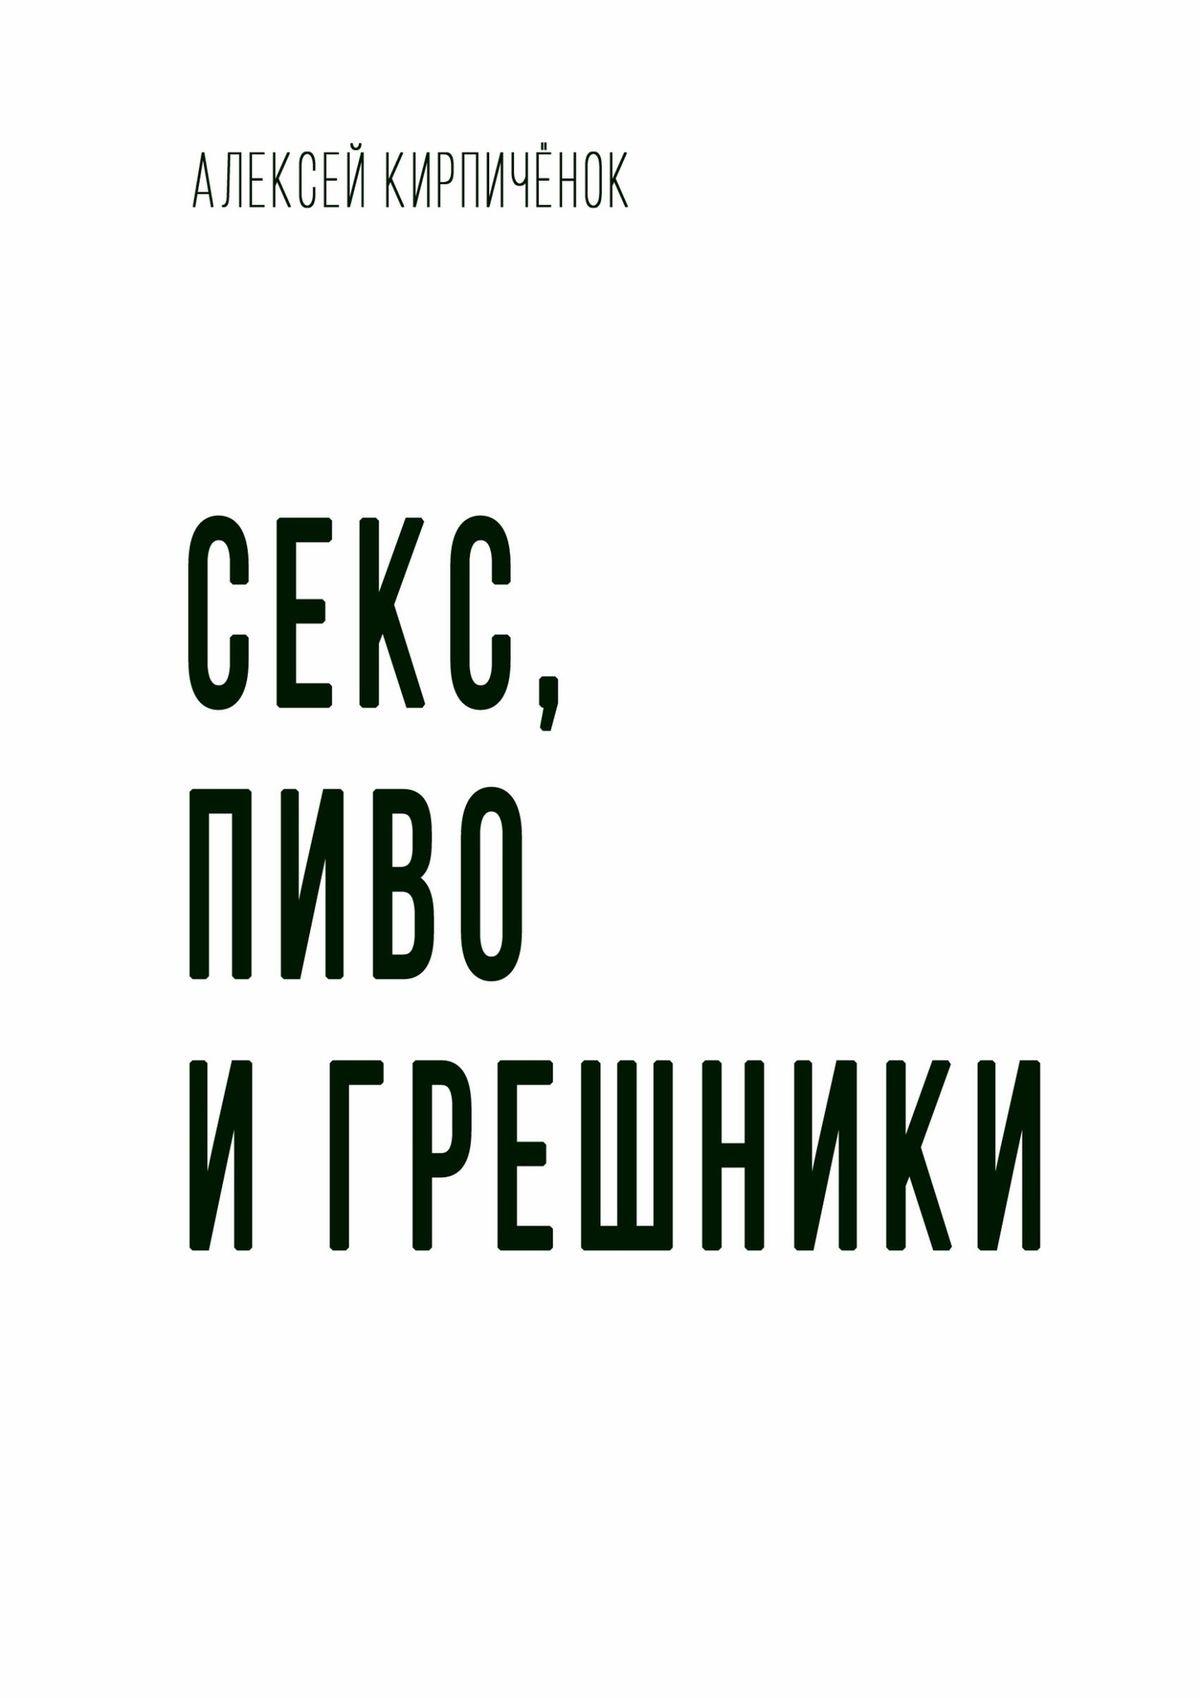 Алексей Кирпичёнок Секс, пиво игрешники надеждин н кнут гамсун грешники и праведники